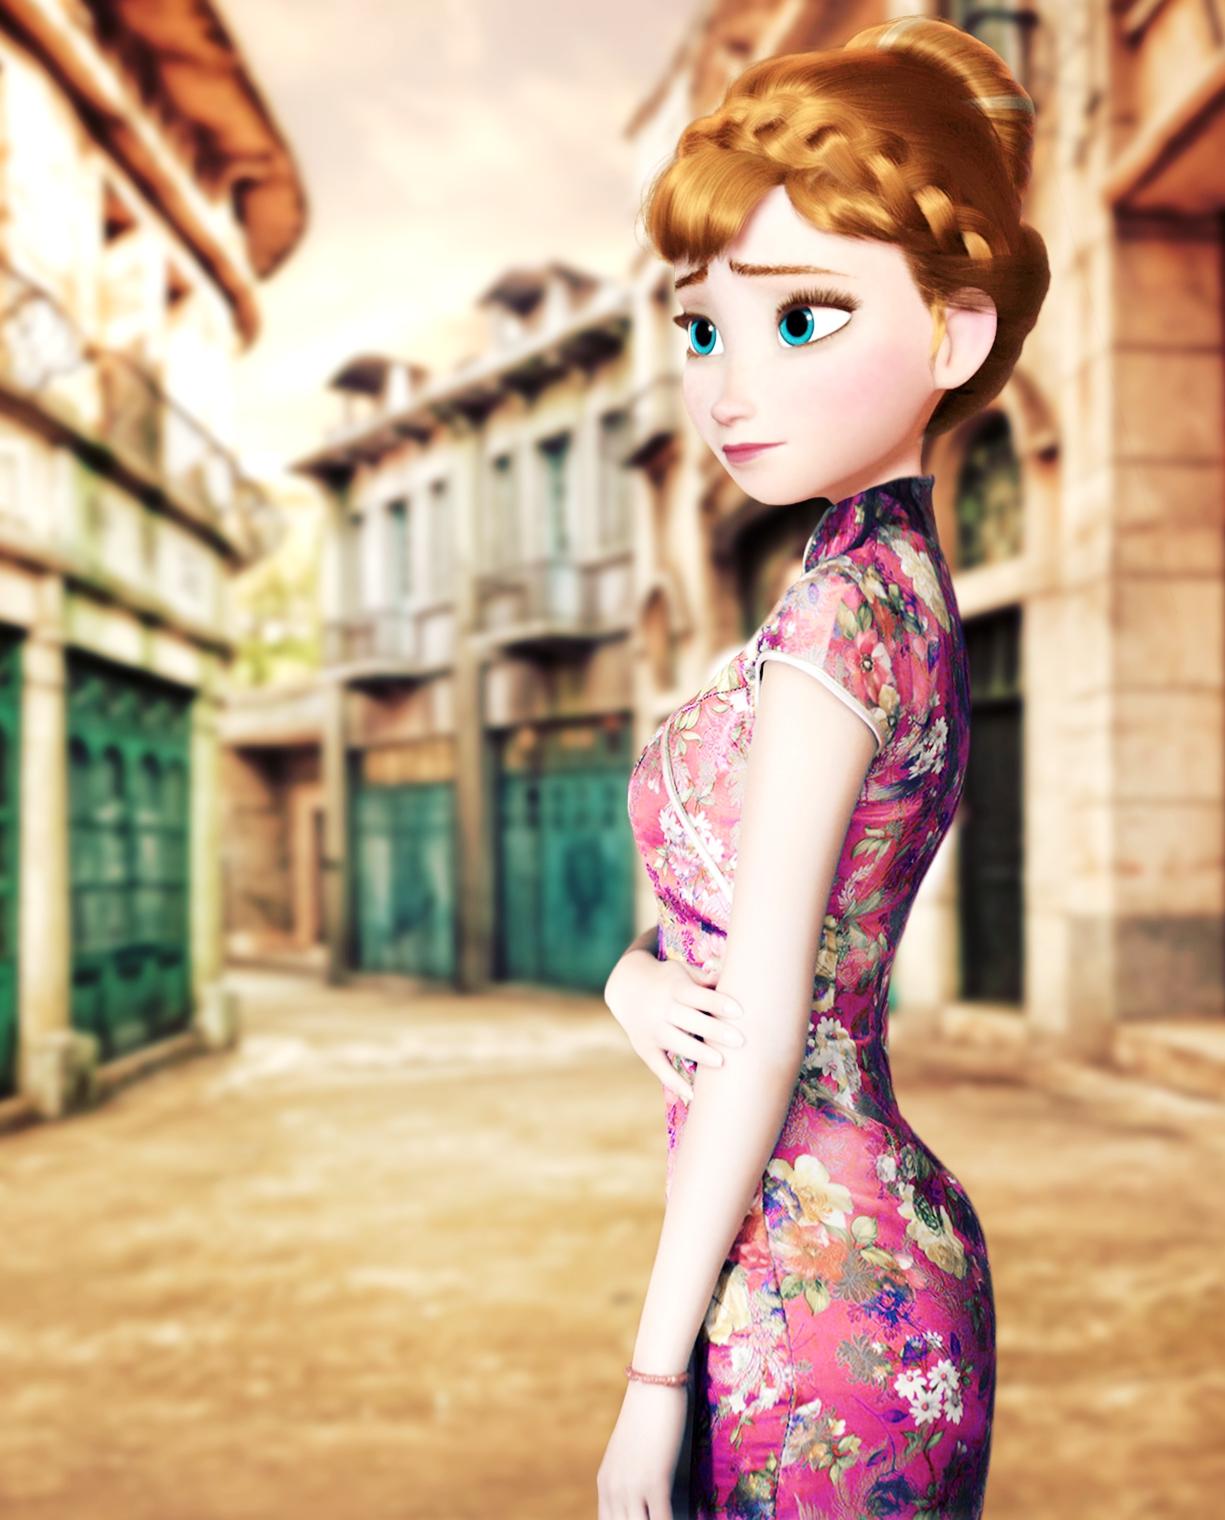 Frozen Anna In Qipao